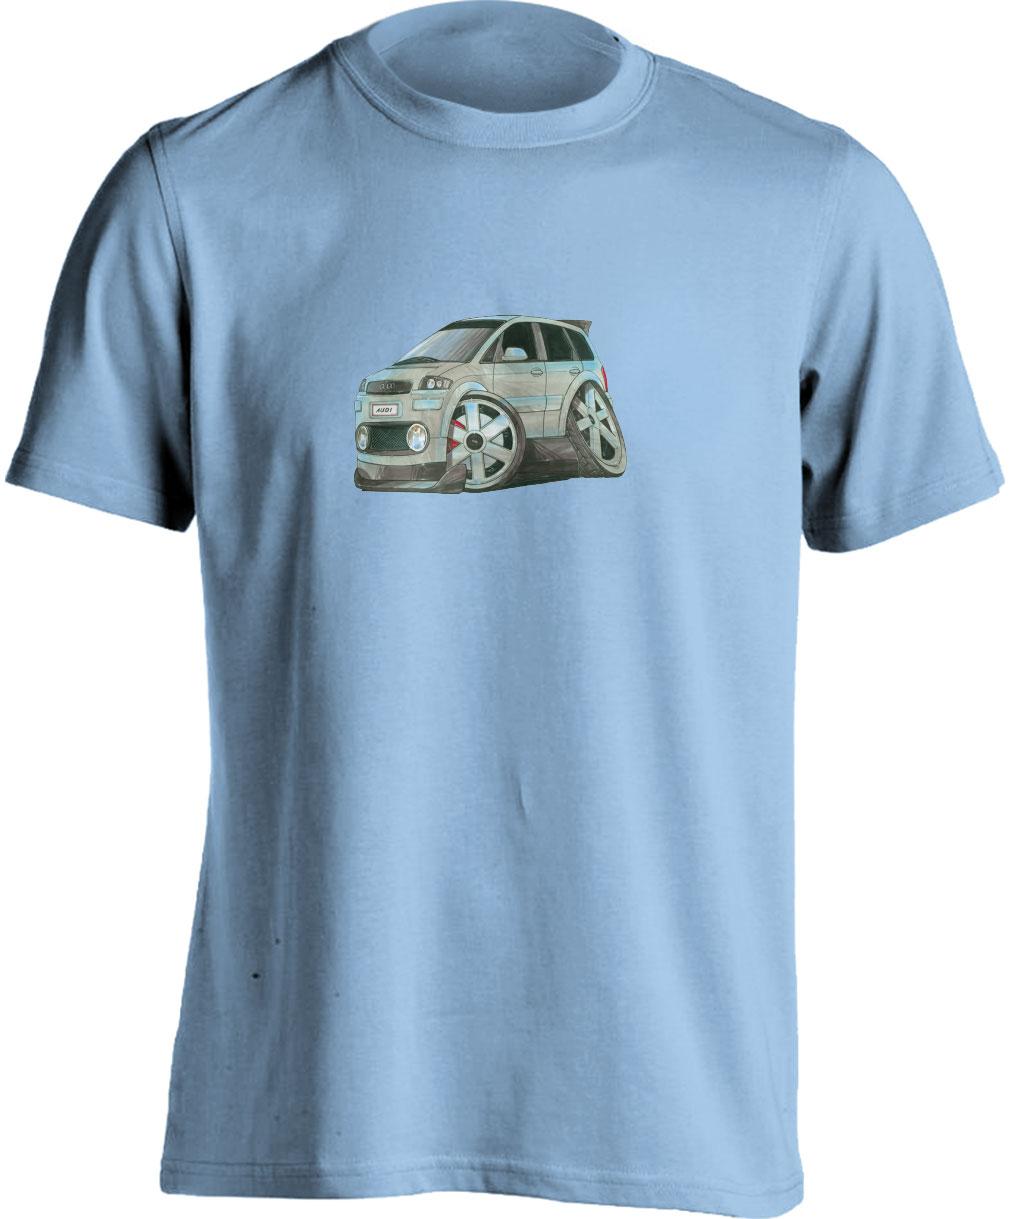 Koolart Audi A2 Silver0741 Child's T Shirt